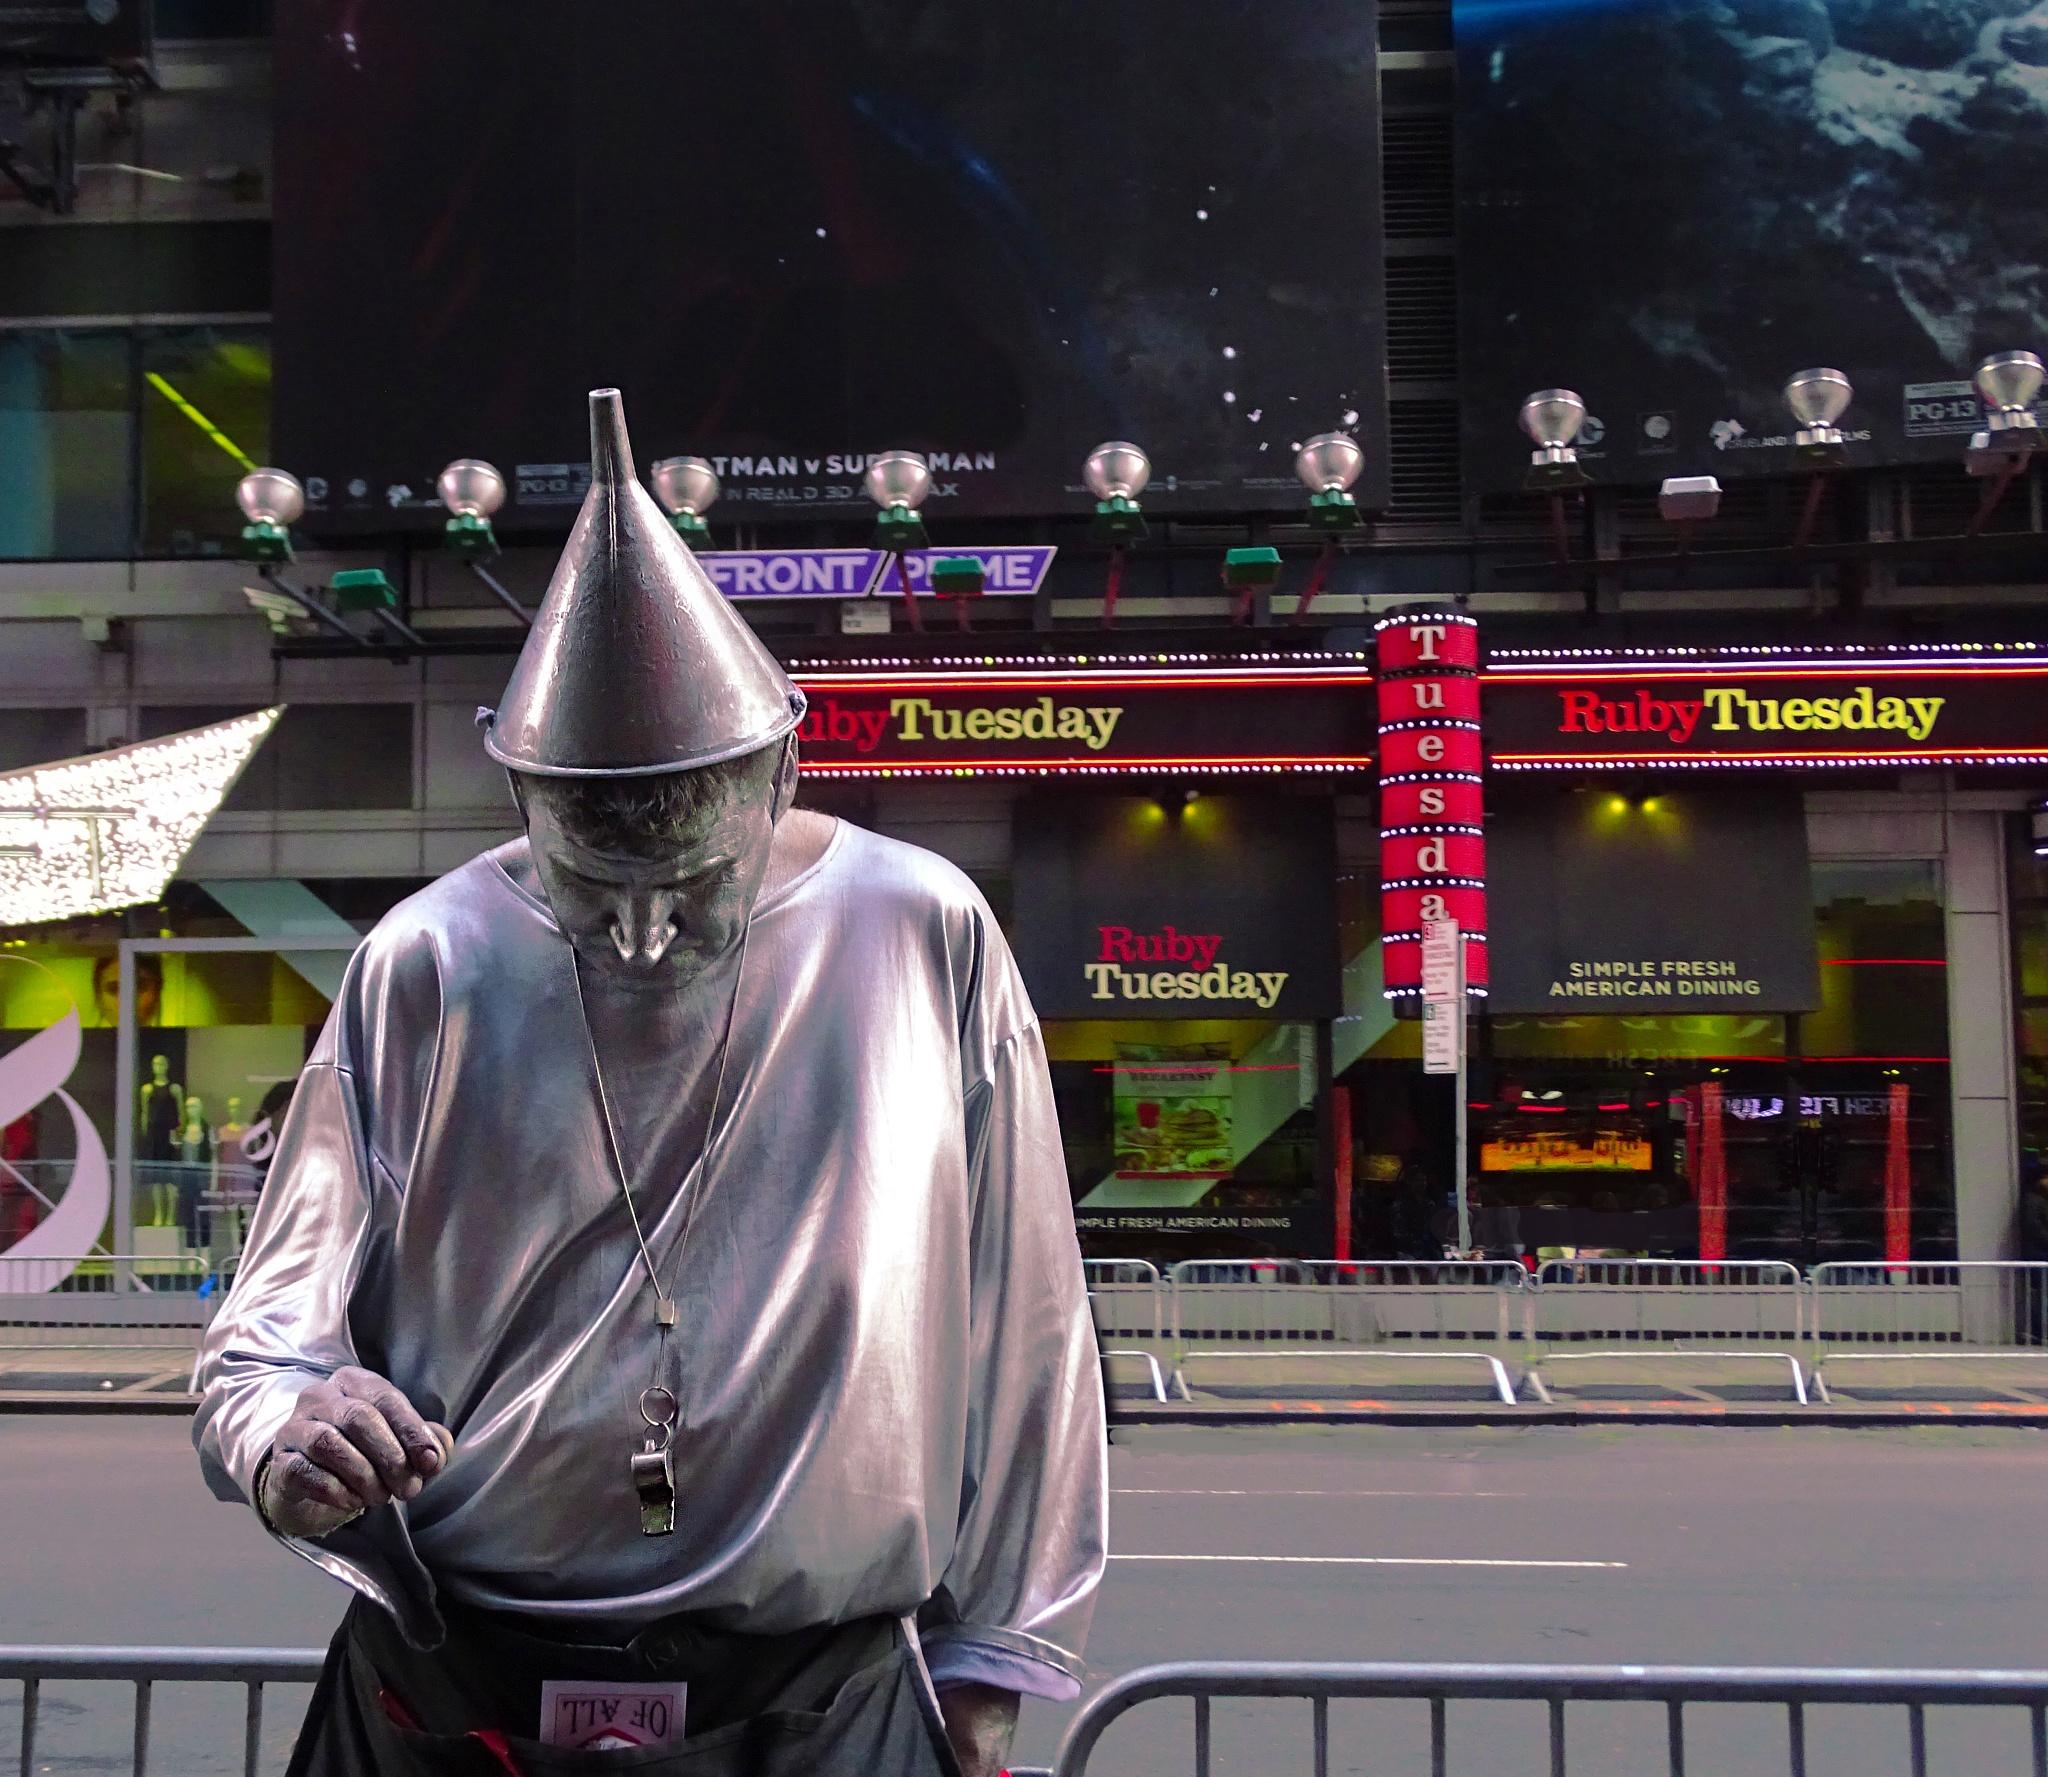 Times Square NYC by Frandy Suero Garcia